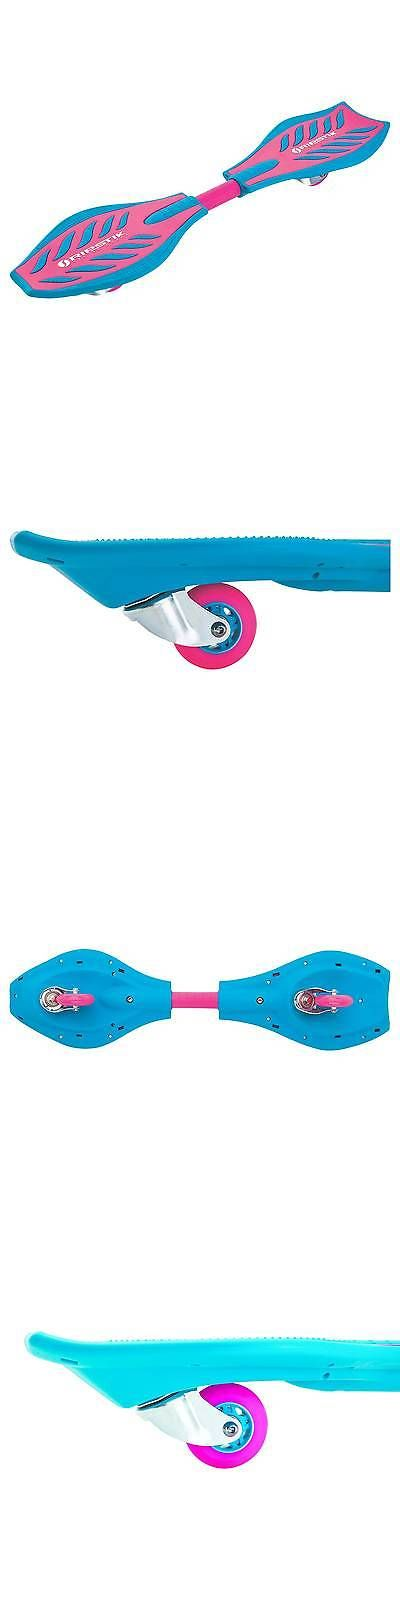 Skateboards-Complete 16264: Razor Ripstik Caster Board - Pink Blue -> BUY IT NOW ONLY: $56.99 on eBay!